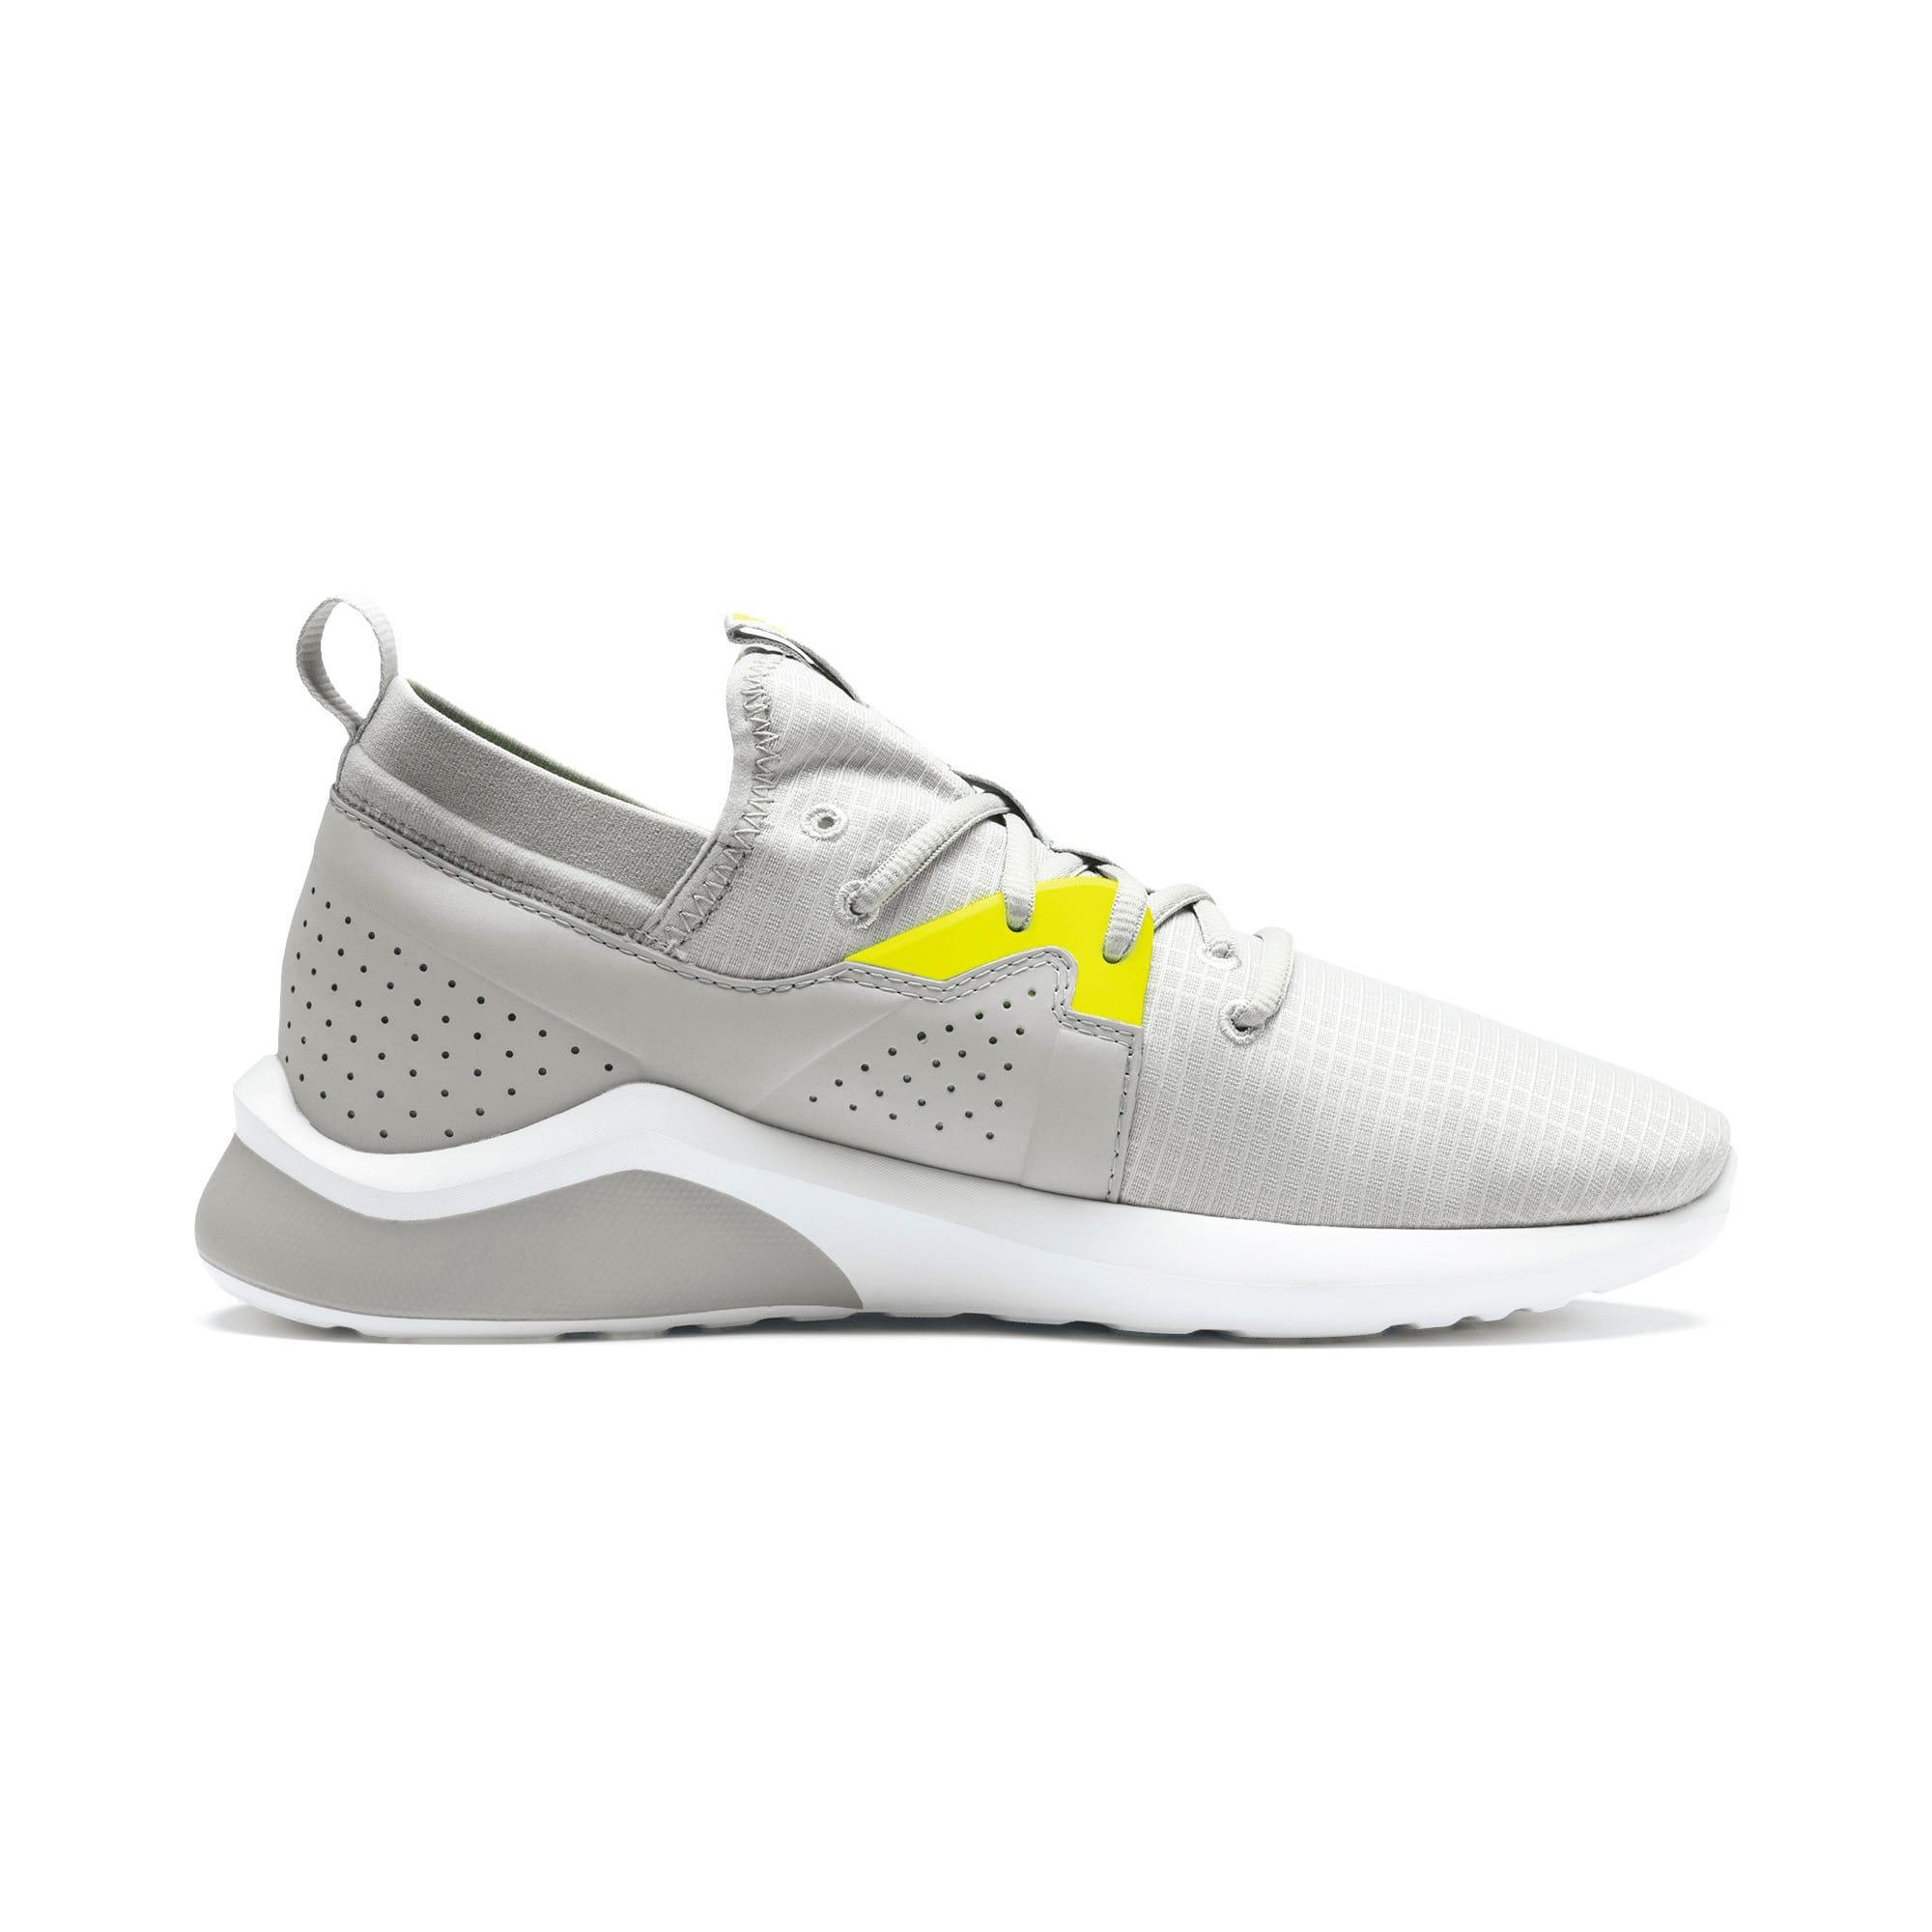 Thumbnail 7 of Emergence Lights Men's Running Shoes, High Rise-Yellow Alert, medium-IND